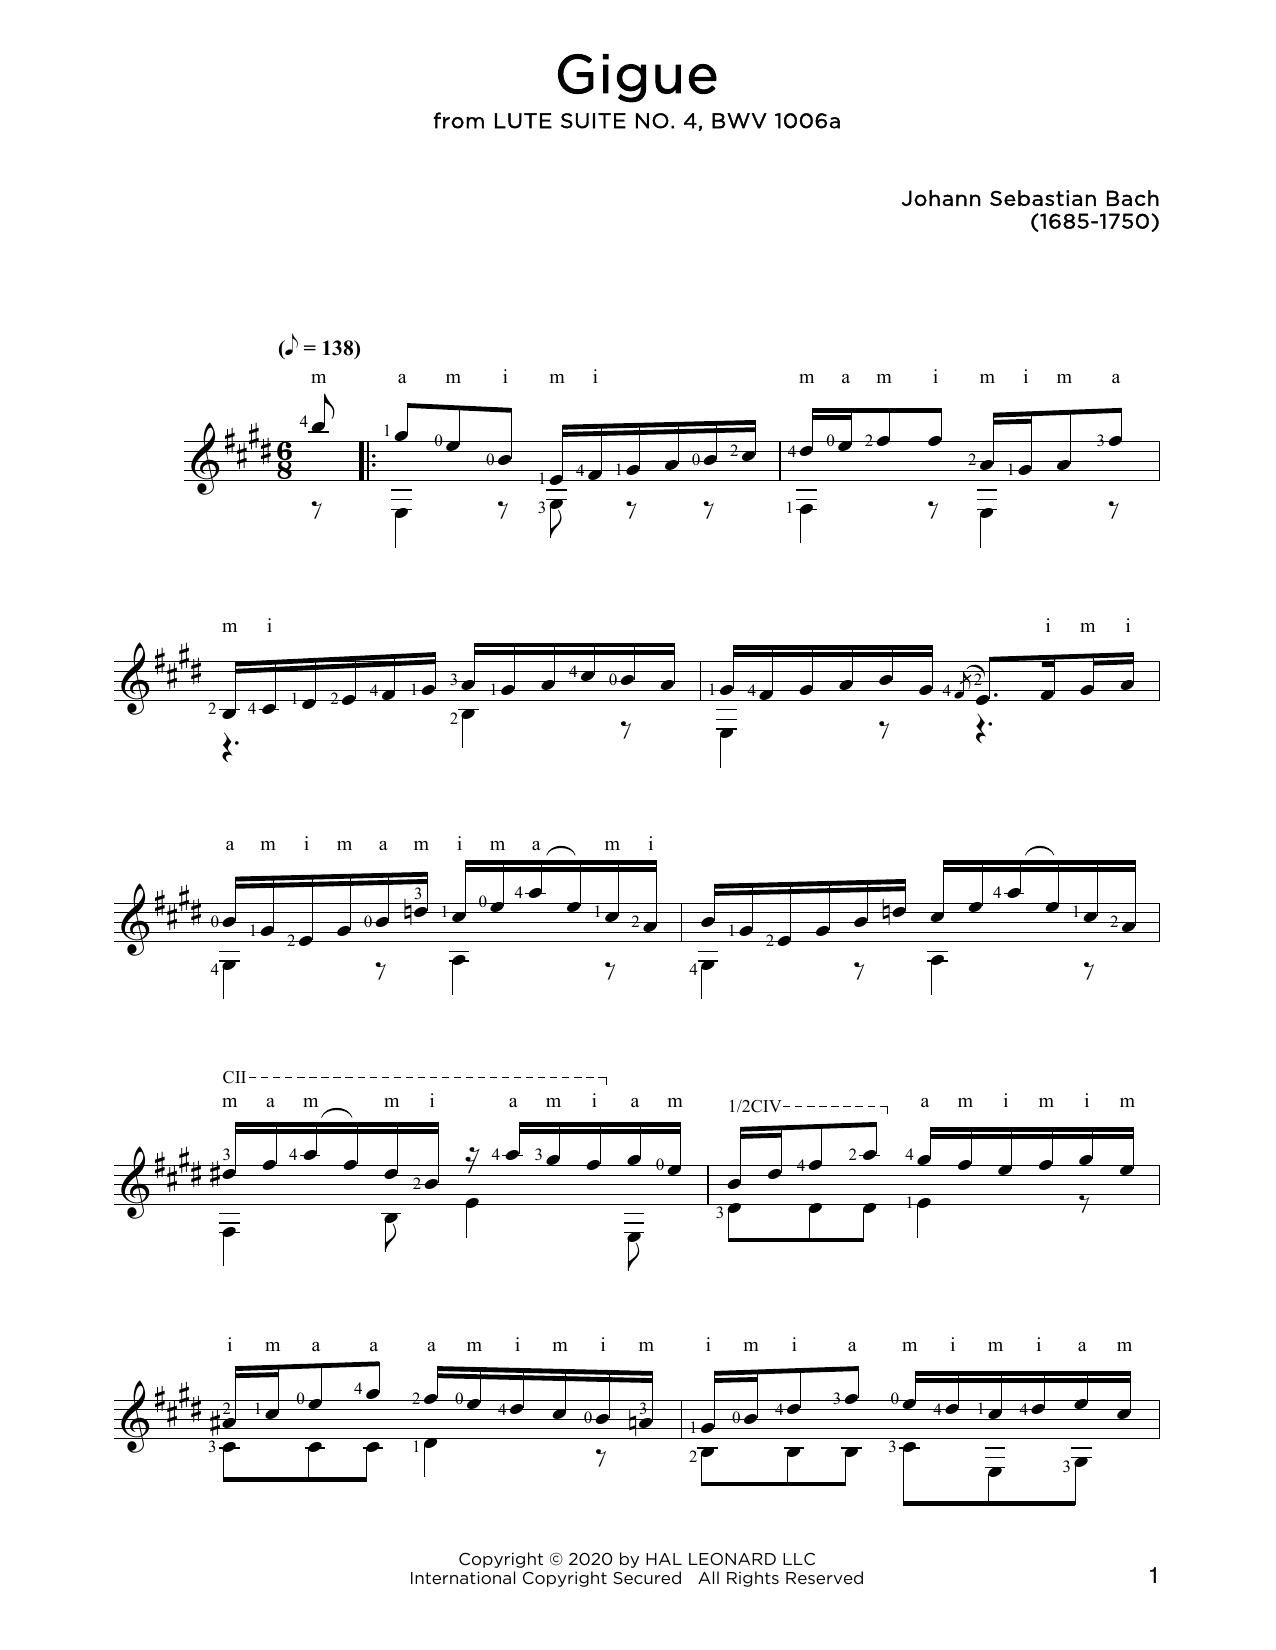 Johann Sebastian Bach Gigue sheet music notes and chords. Download Printable PDF.